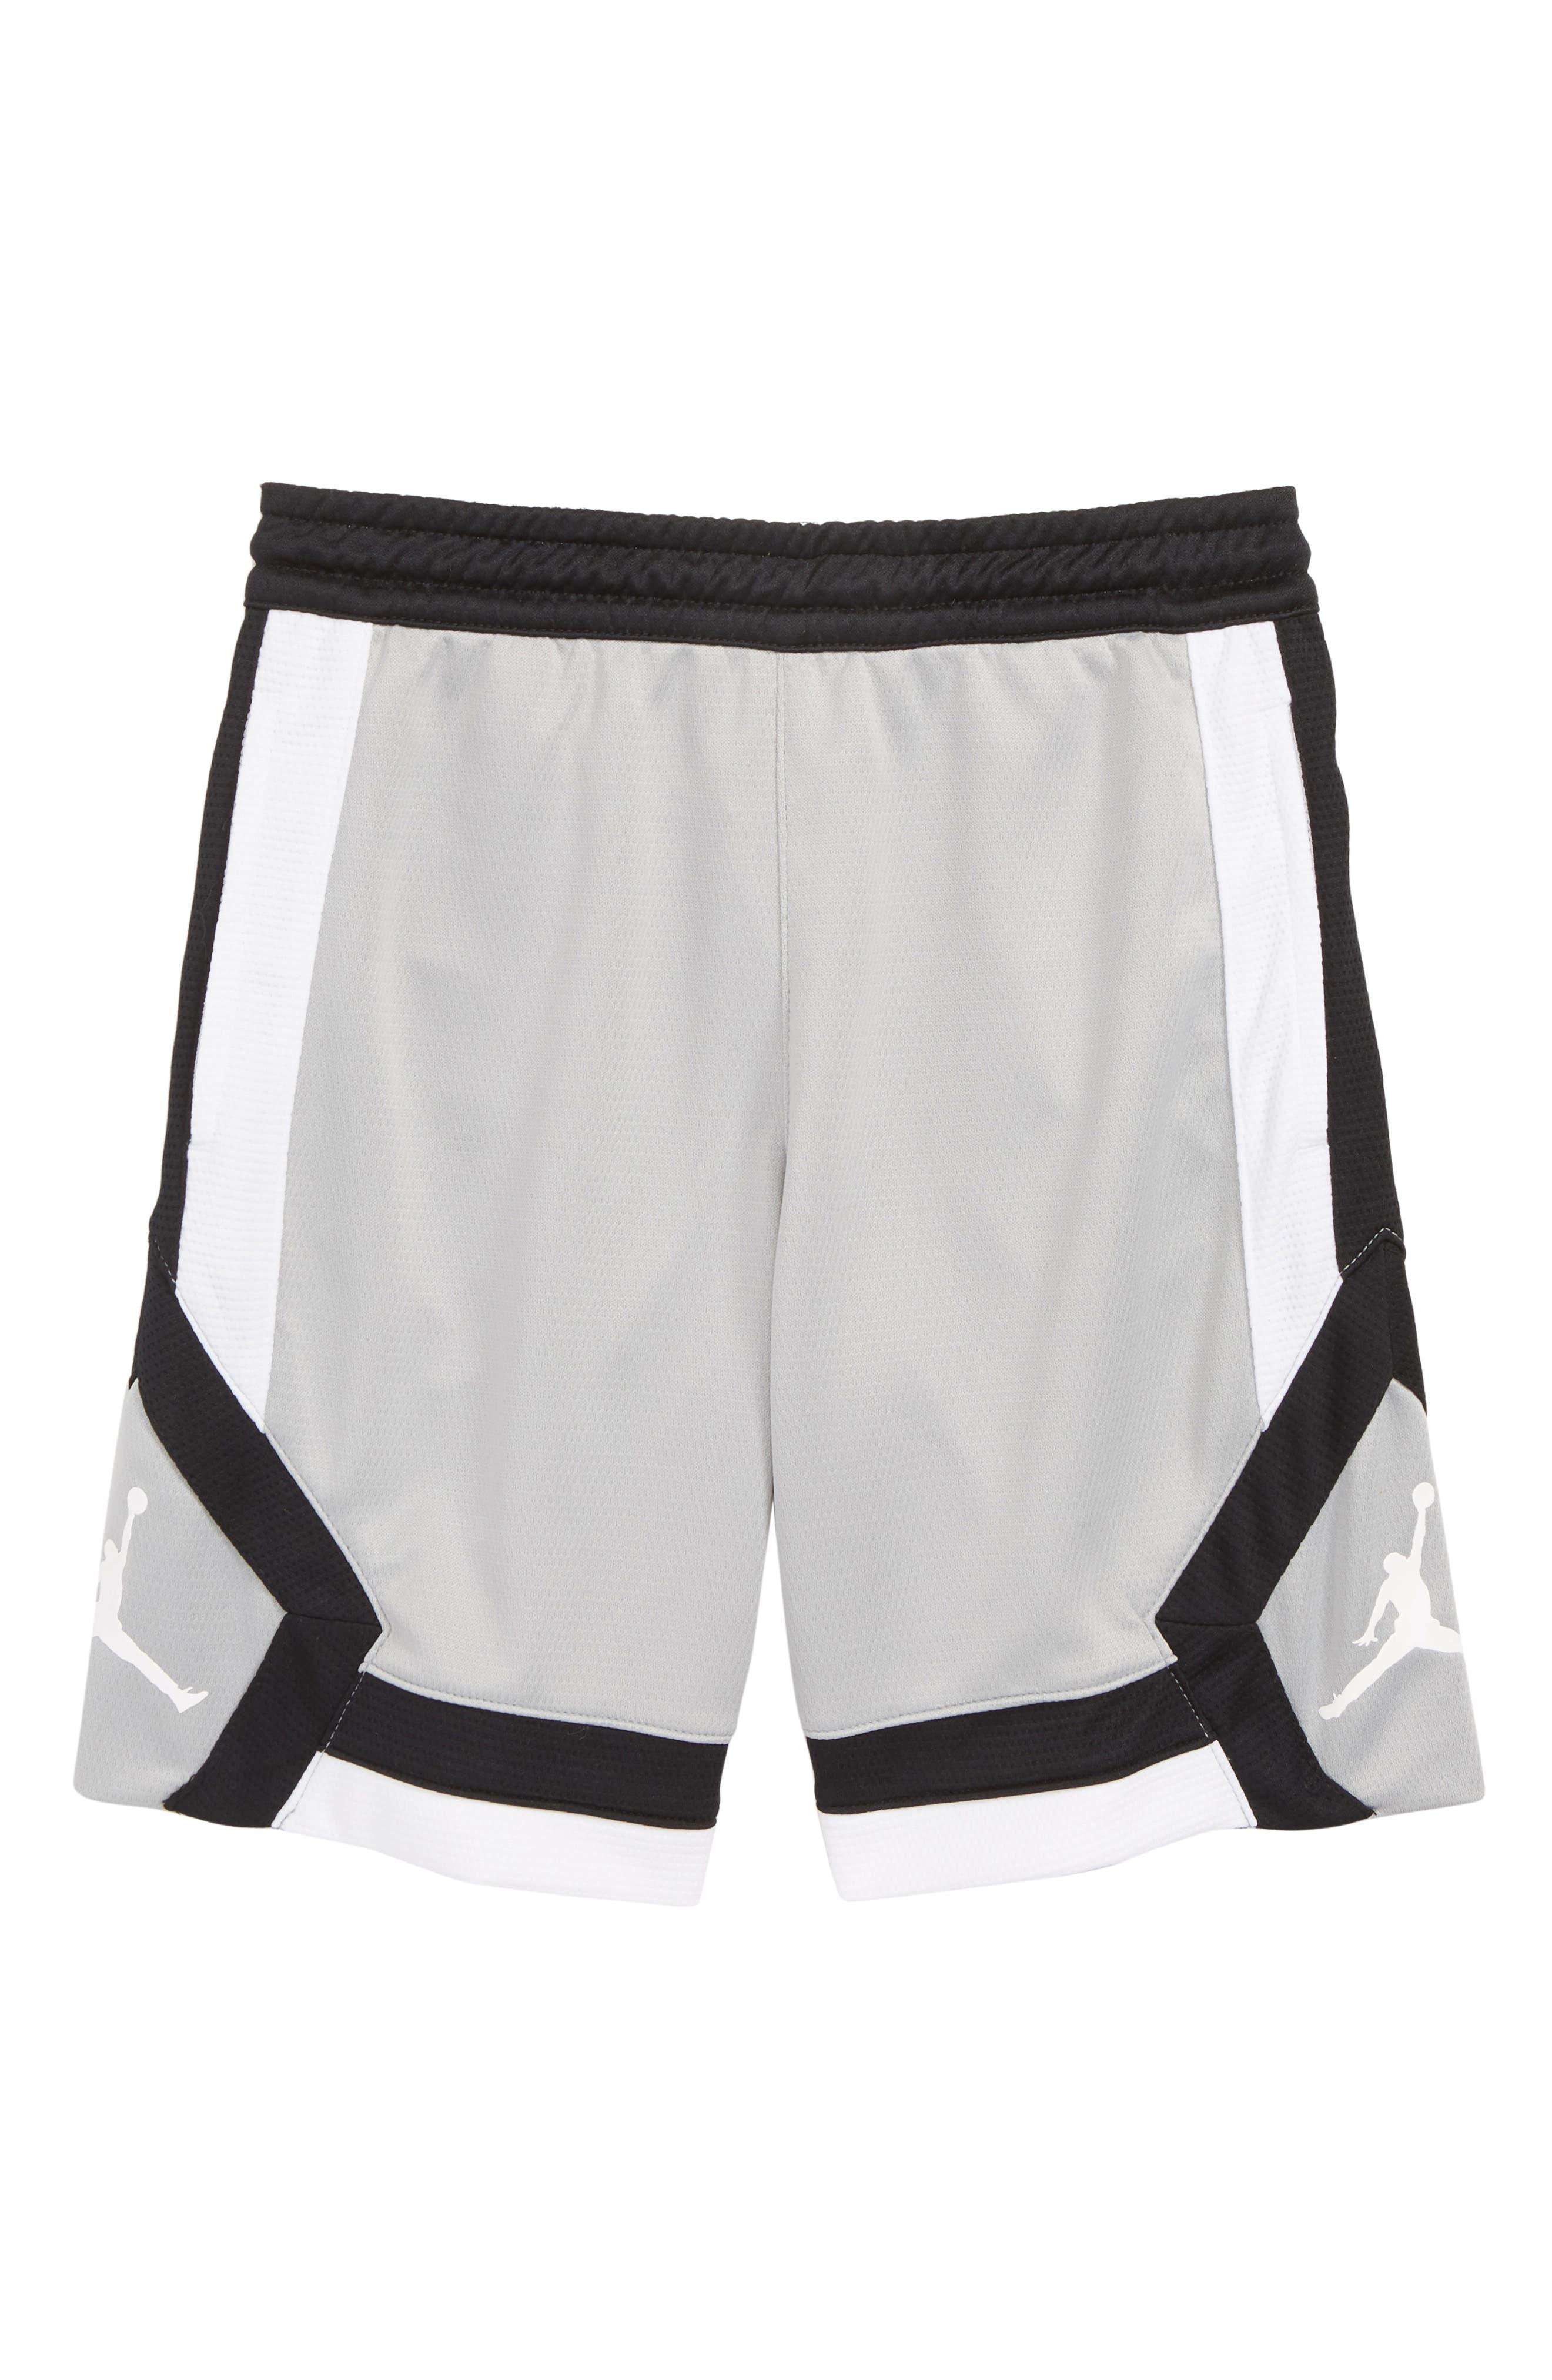 Jordan Rise Athletic Shorts,                         Main,                         color, LIGHT SMOKE GREY